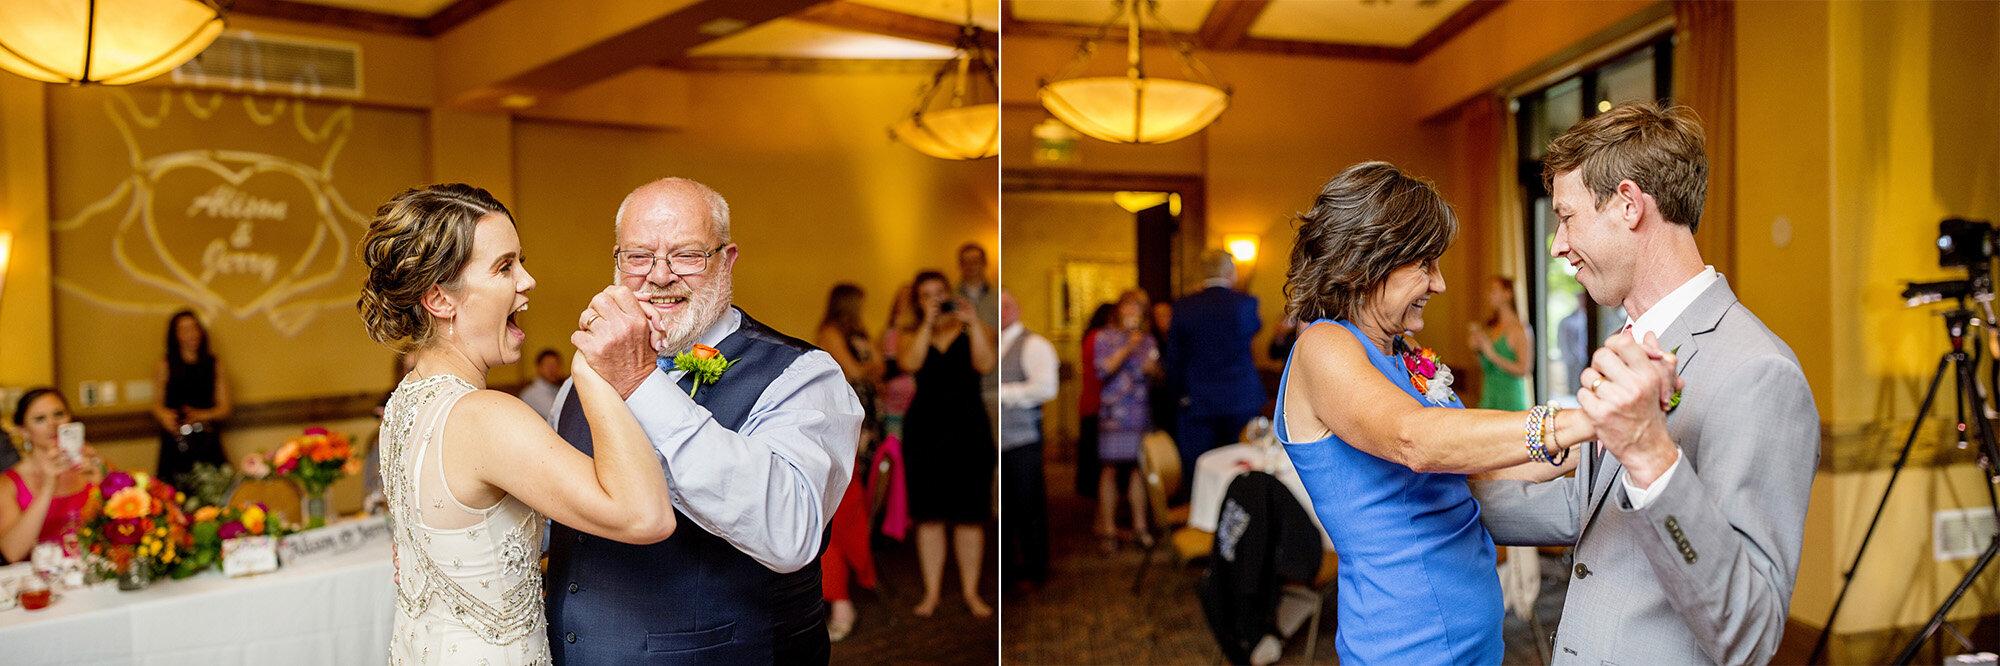 Seriously_Sabrina_Photography_Colorado_Springs_Club_at_Flying_Horse_Destination_Wedding_ODwyer119.jpg